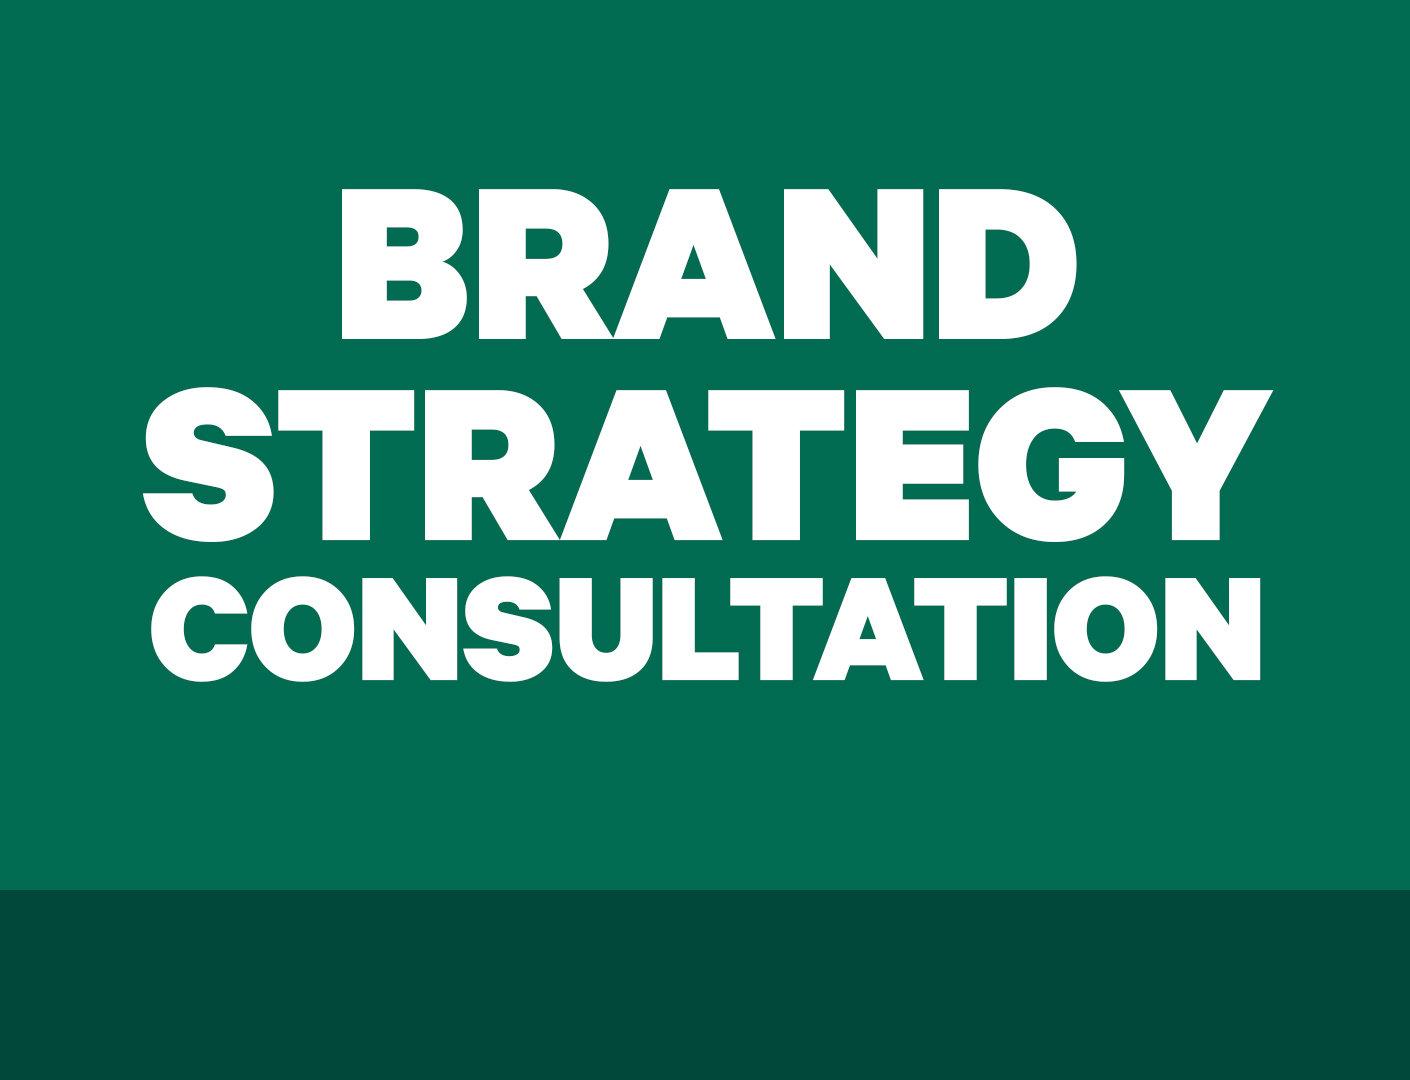 Branding Strategy Consultation